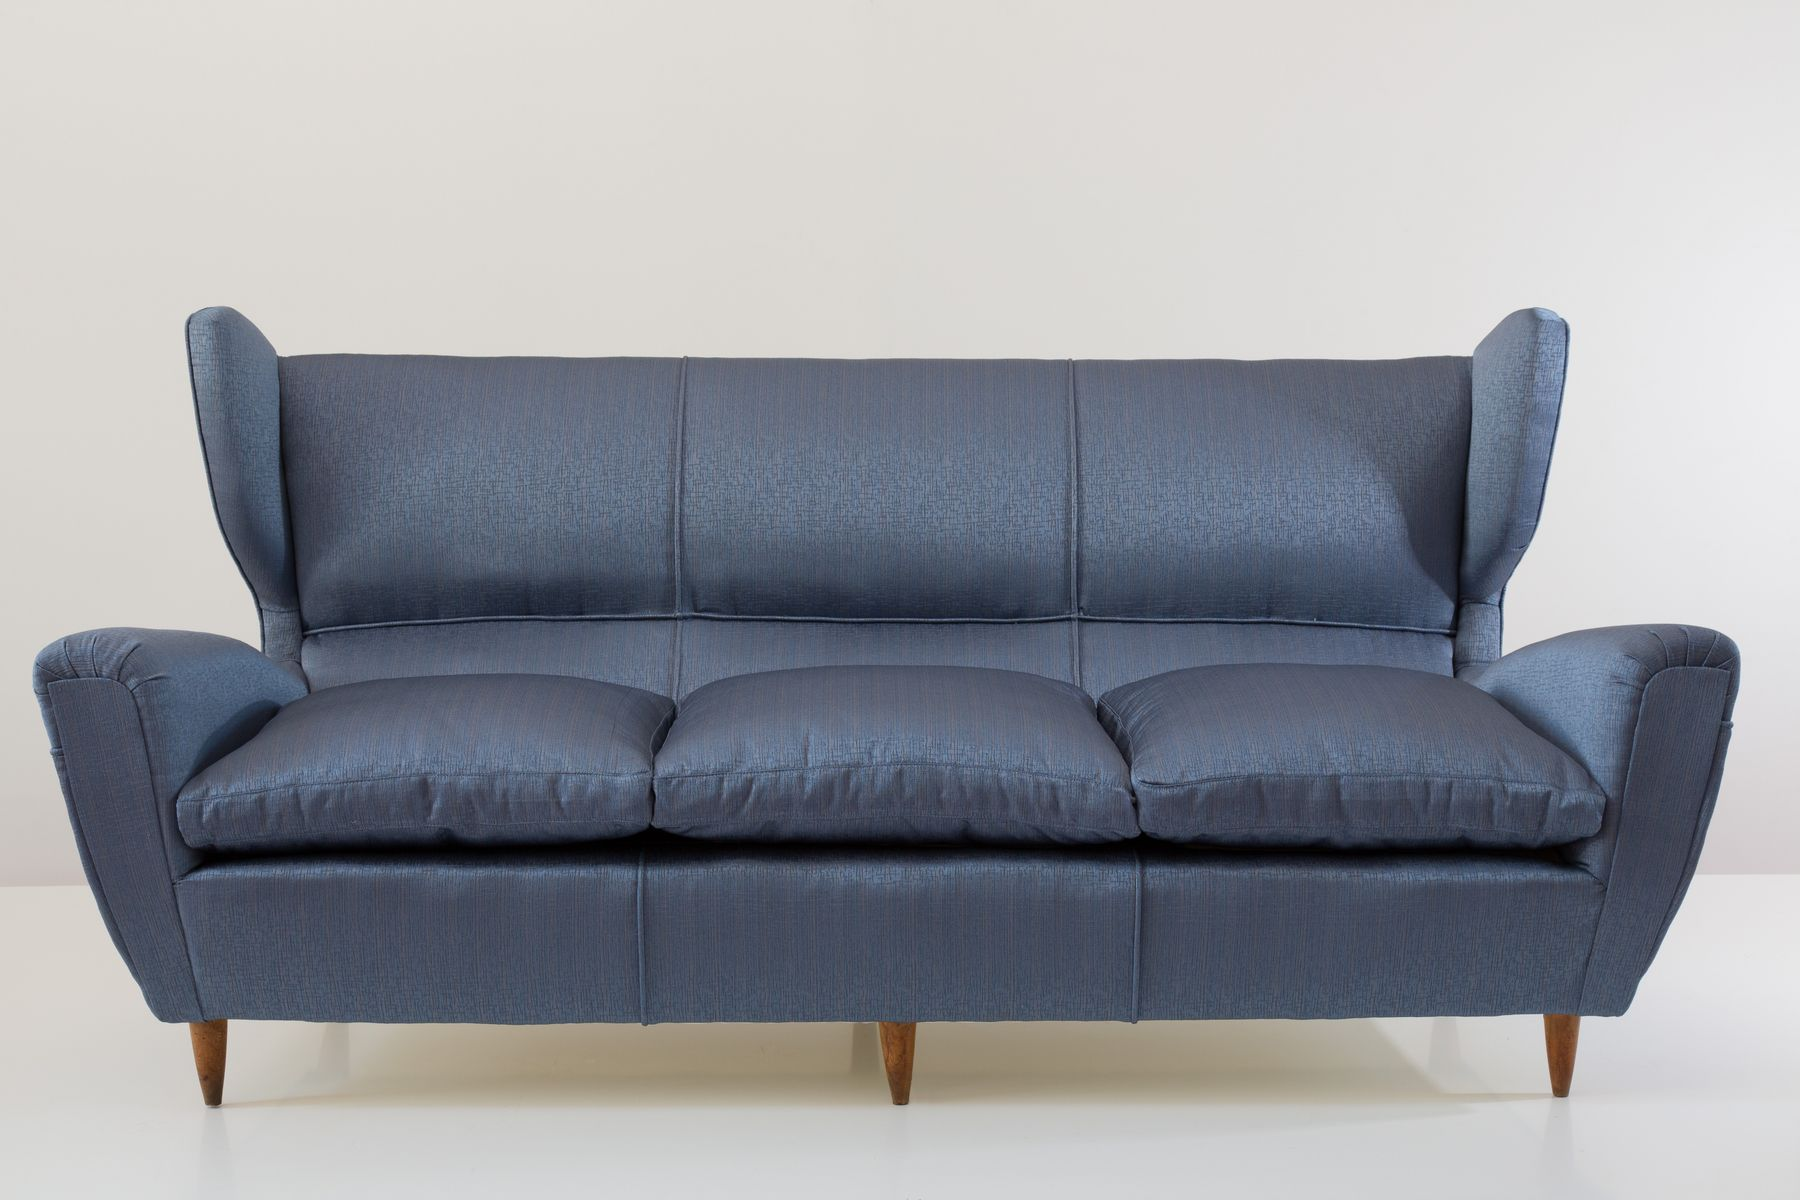 drei sitzer ohrensessel sofa von paolo buffa bei pamono kaufen. Black Bedroom Furniture Sets. Home Design Ideas